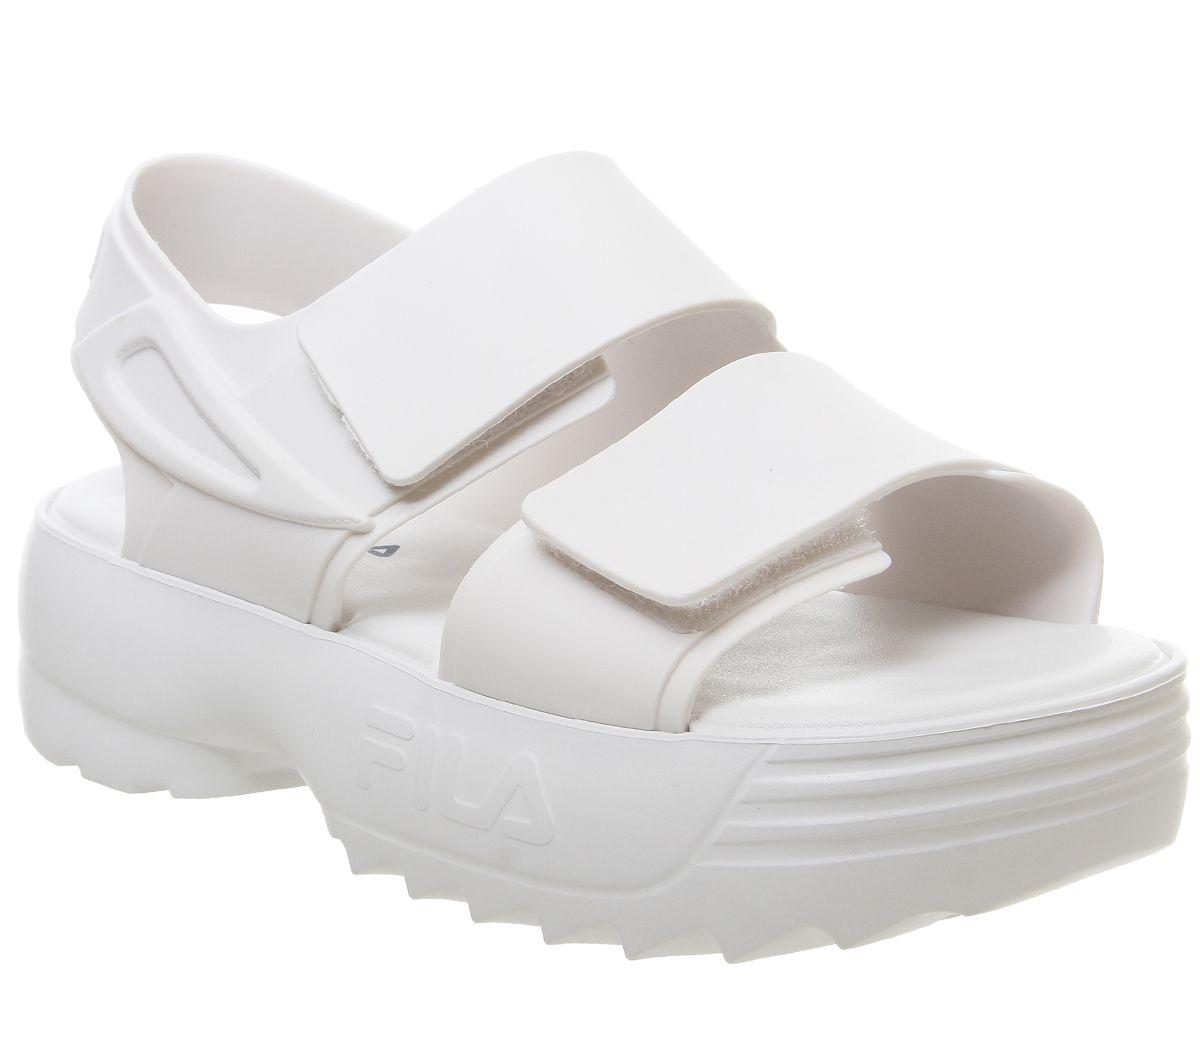 ccd8453847 Melissa + Fila Sandals